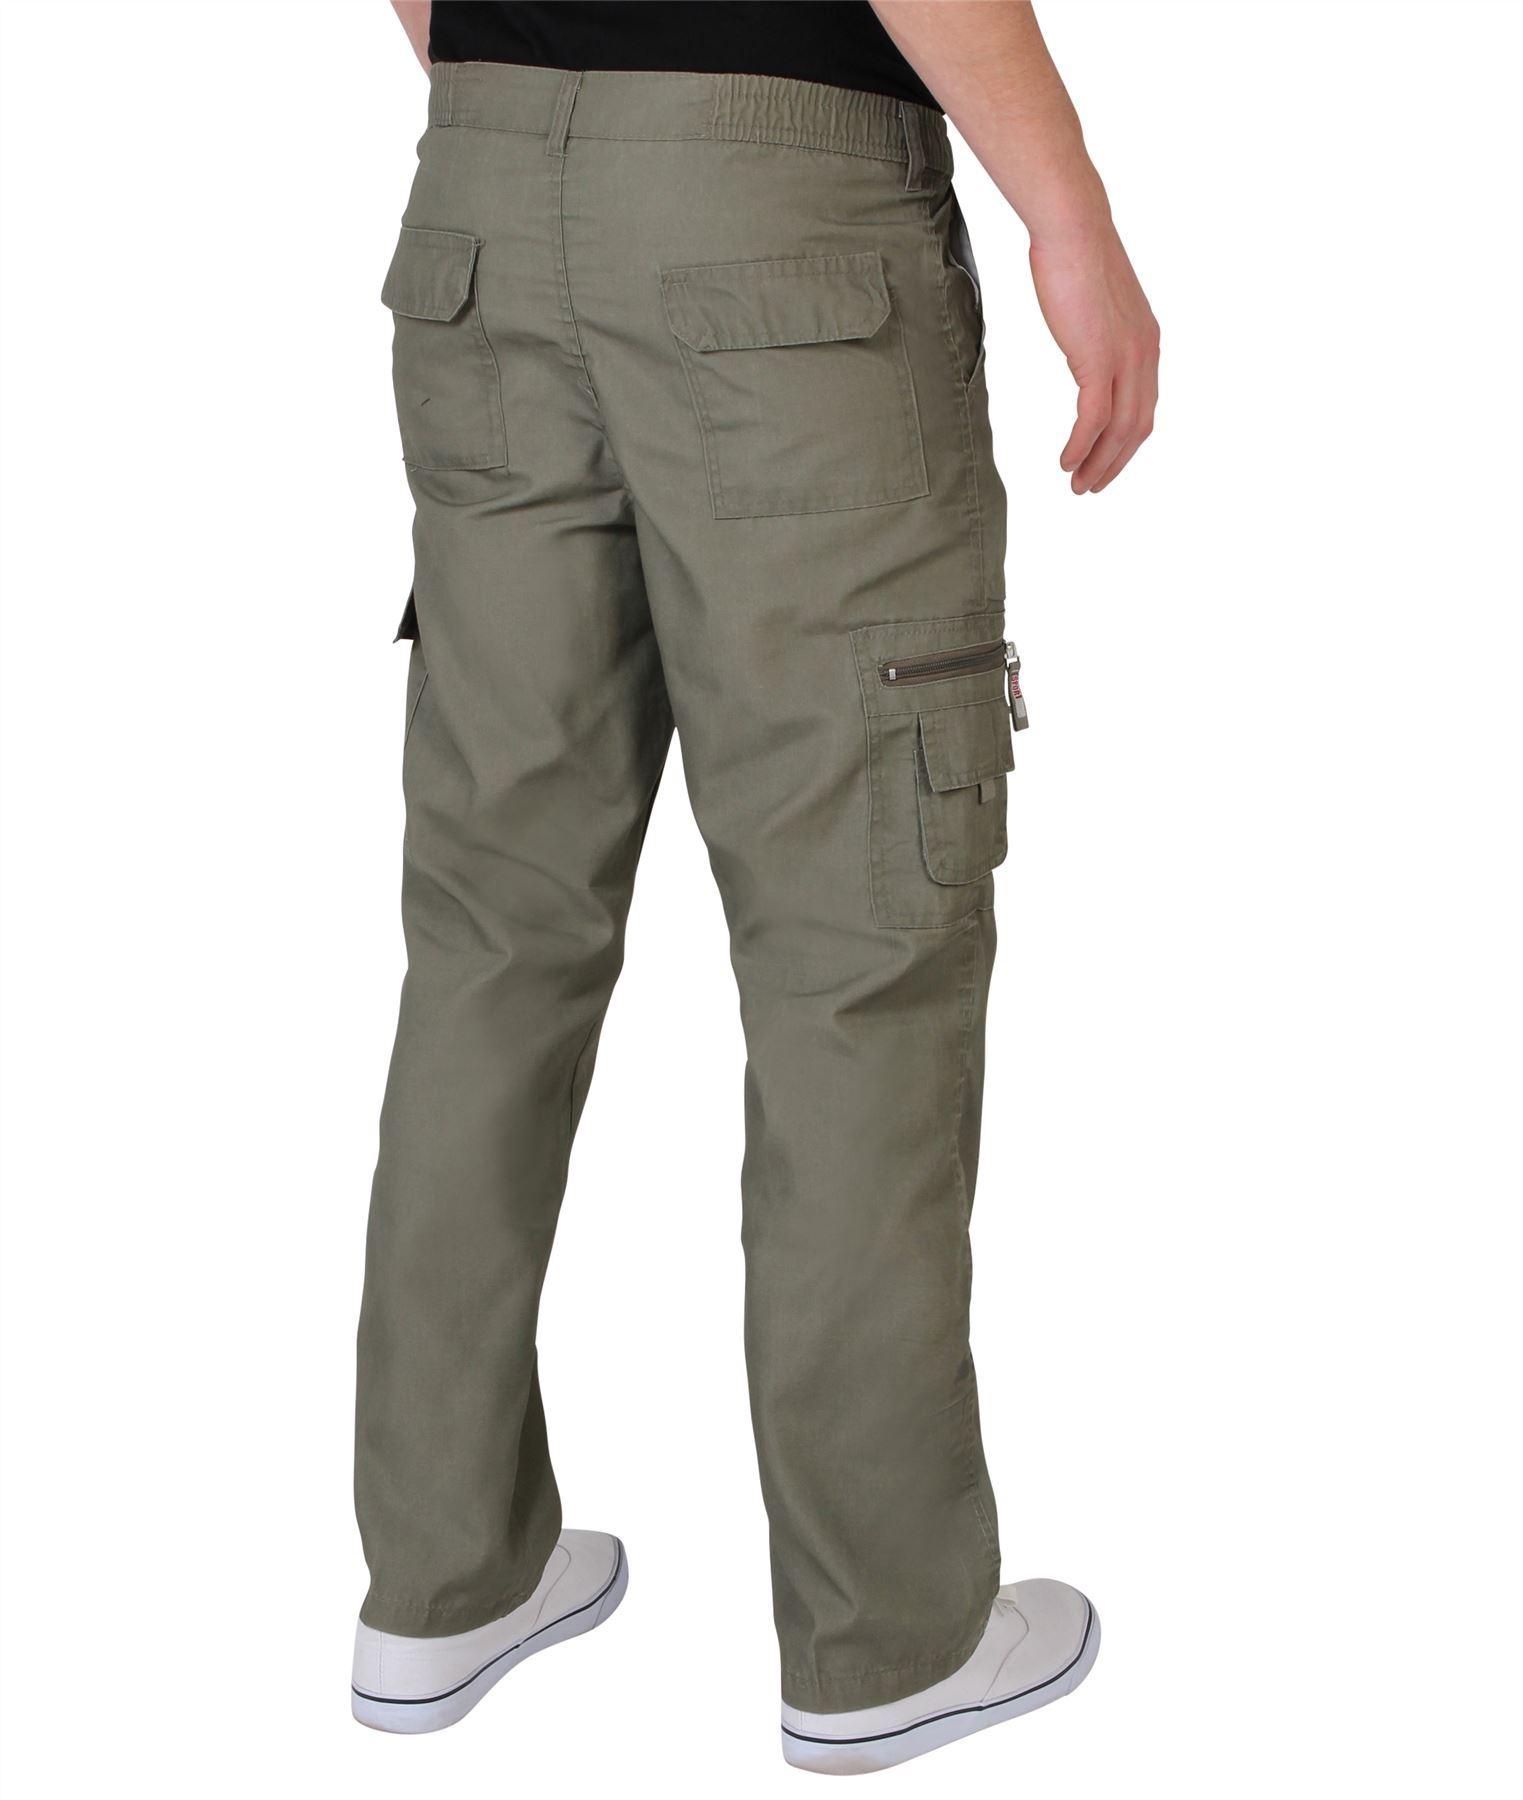 Pantalones-Hombre-Estilo-Cargo-Militar-Combate-Multibolsillos-Casual miniatura 13